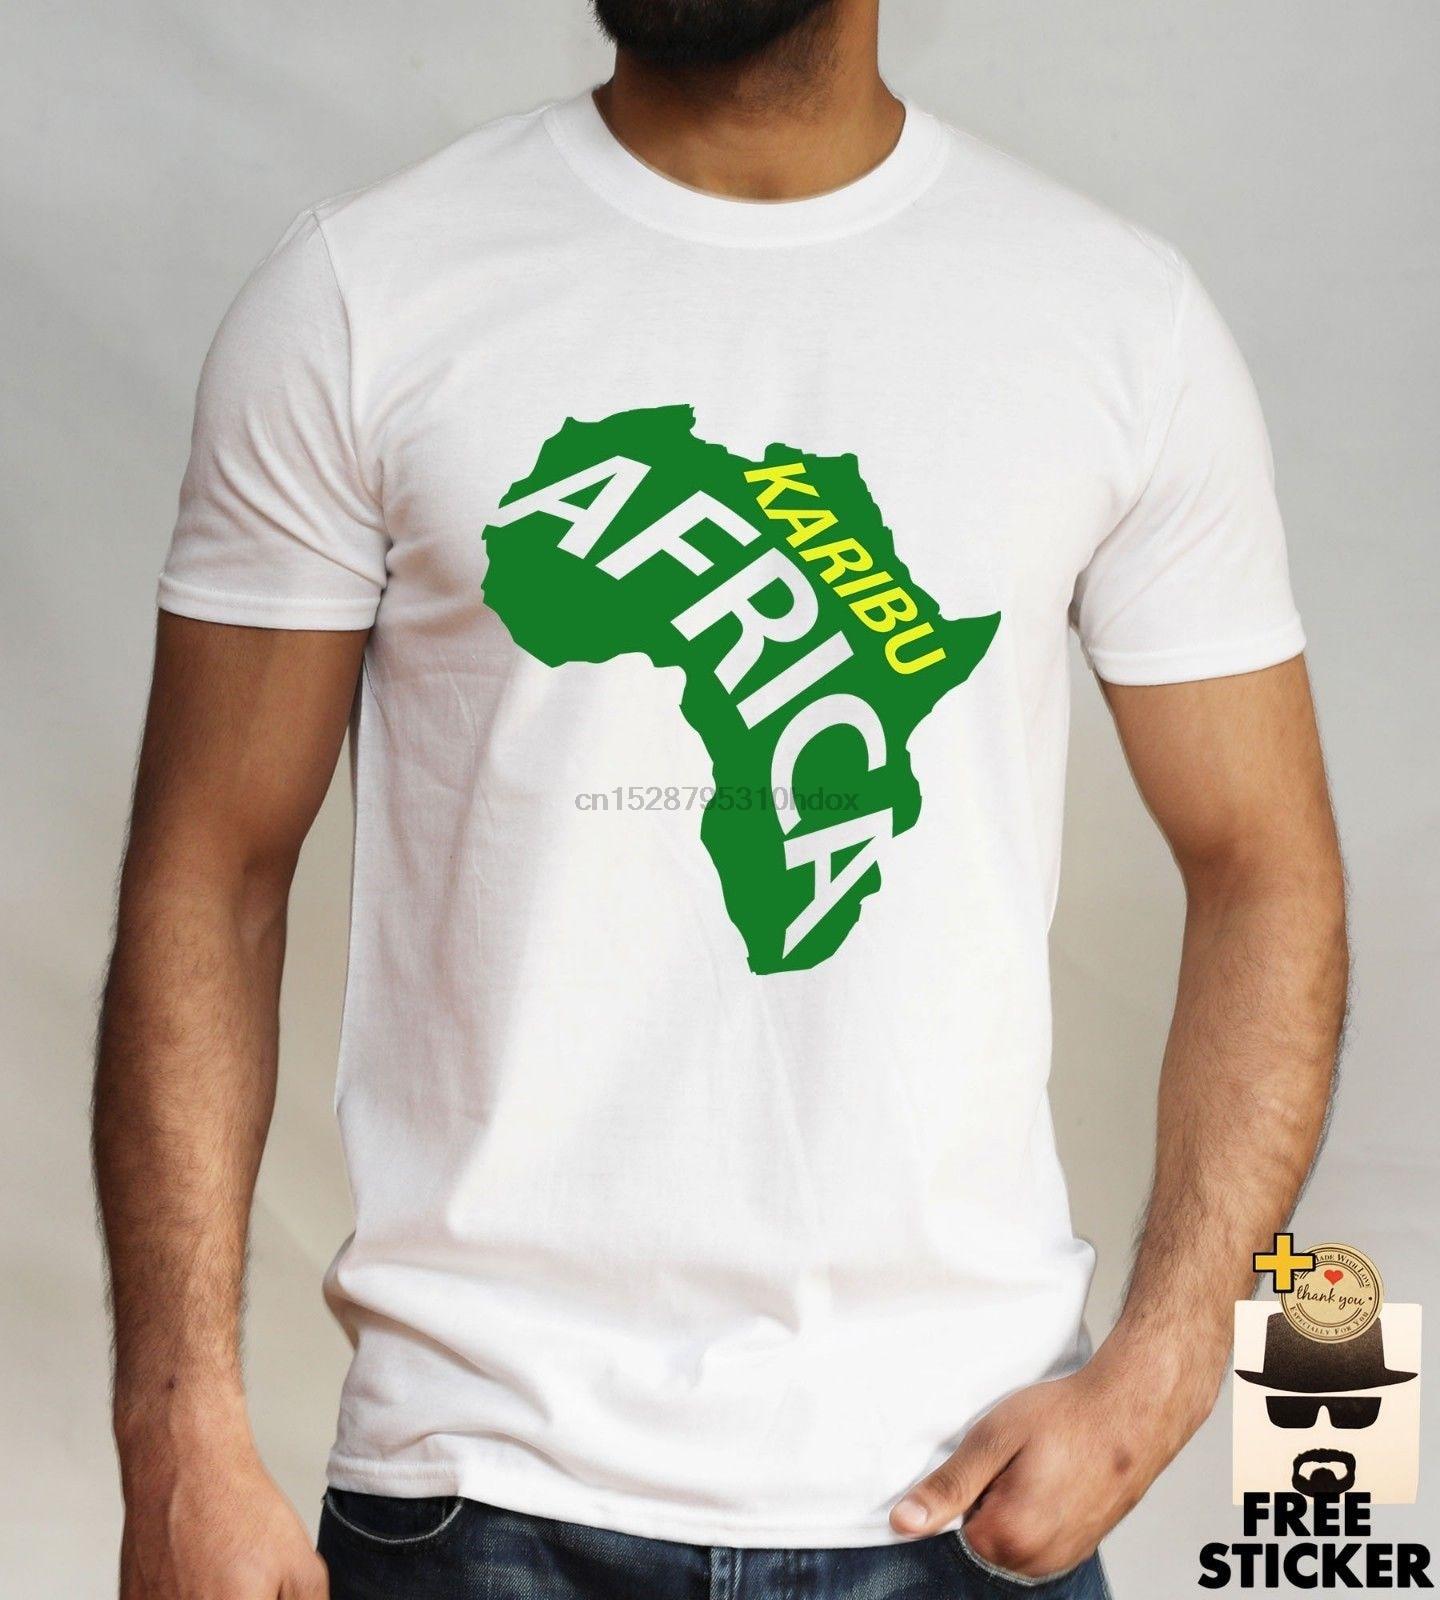 Karibu African T Shirt Tanzania Kenya Zanzibar Uganda Kilimanjaro Touristmen 2019 Summer Fashion Top Selling Designer T Shirt T Shirts Aliexpress